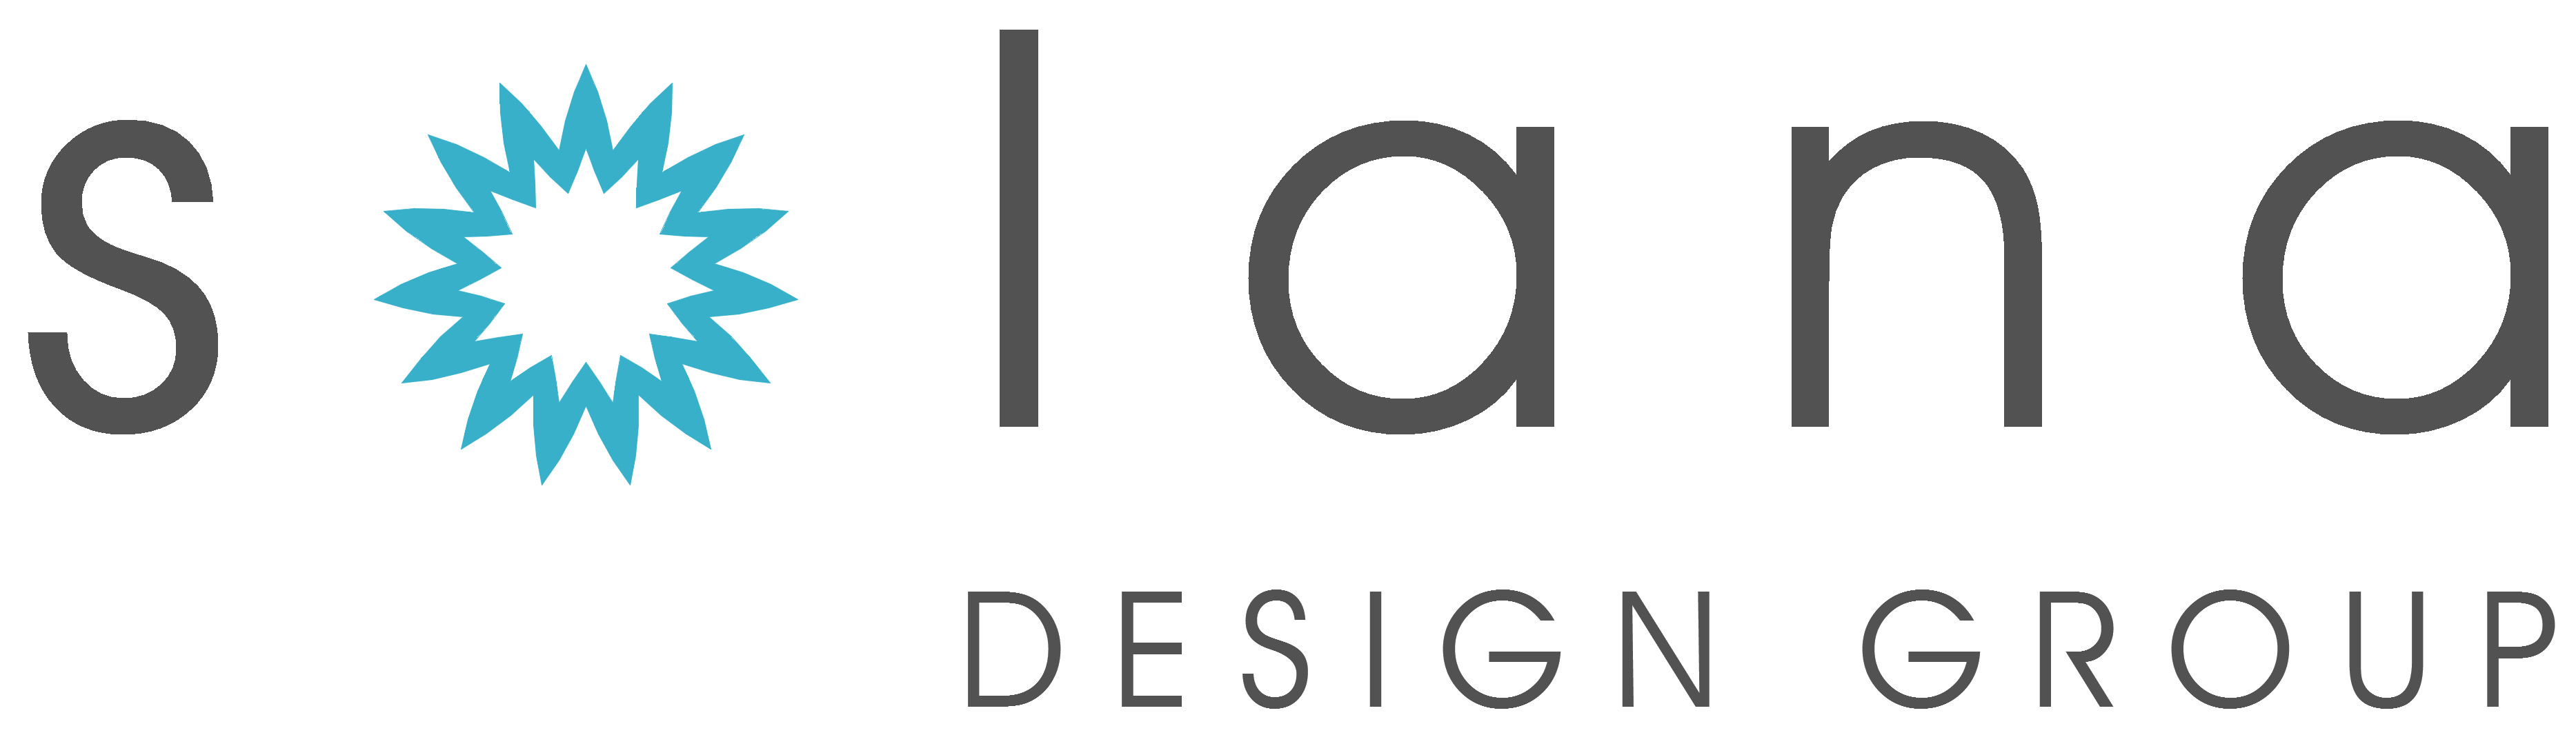 Solana Design Group